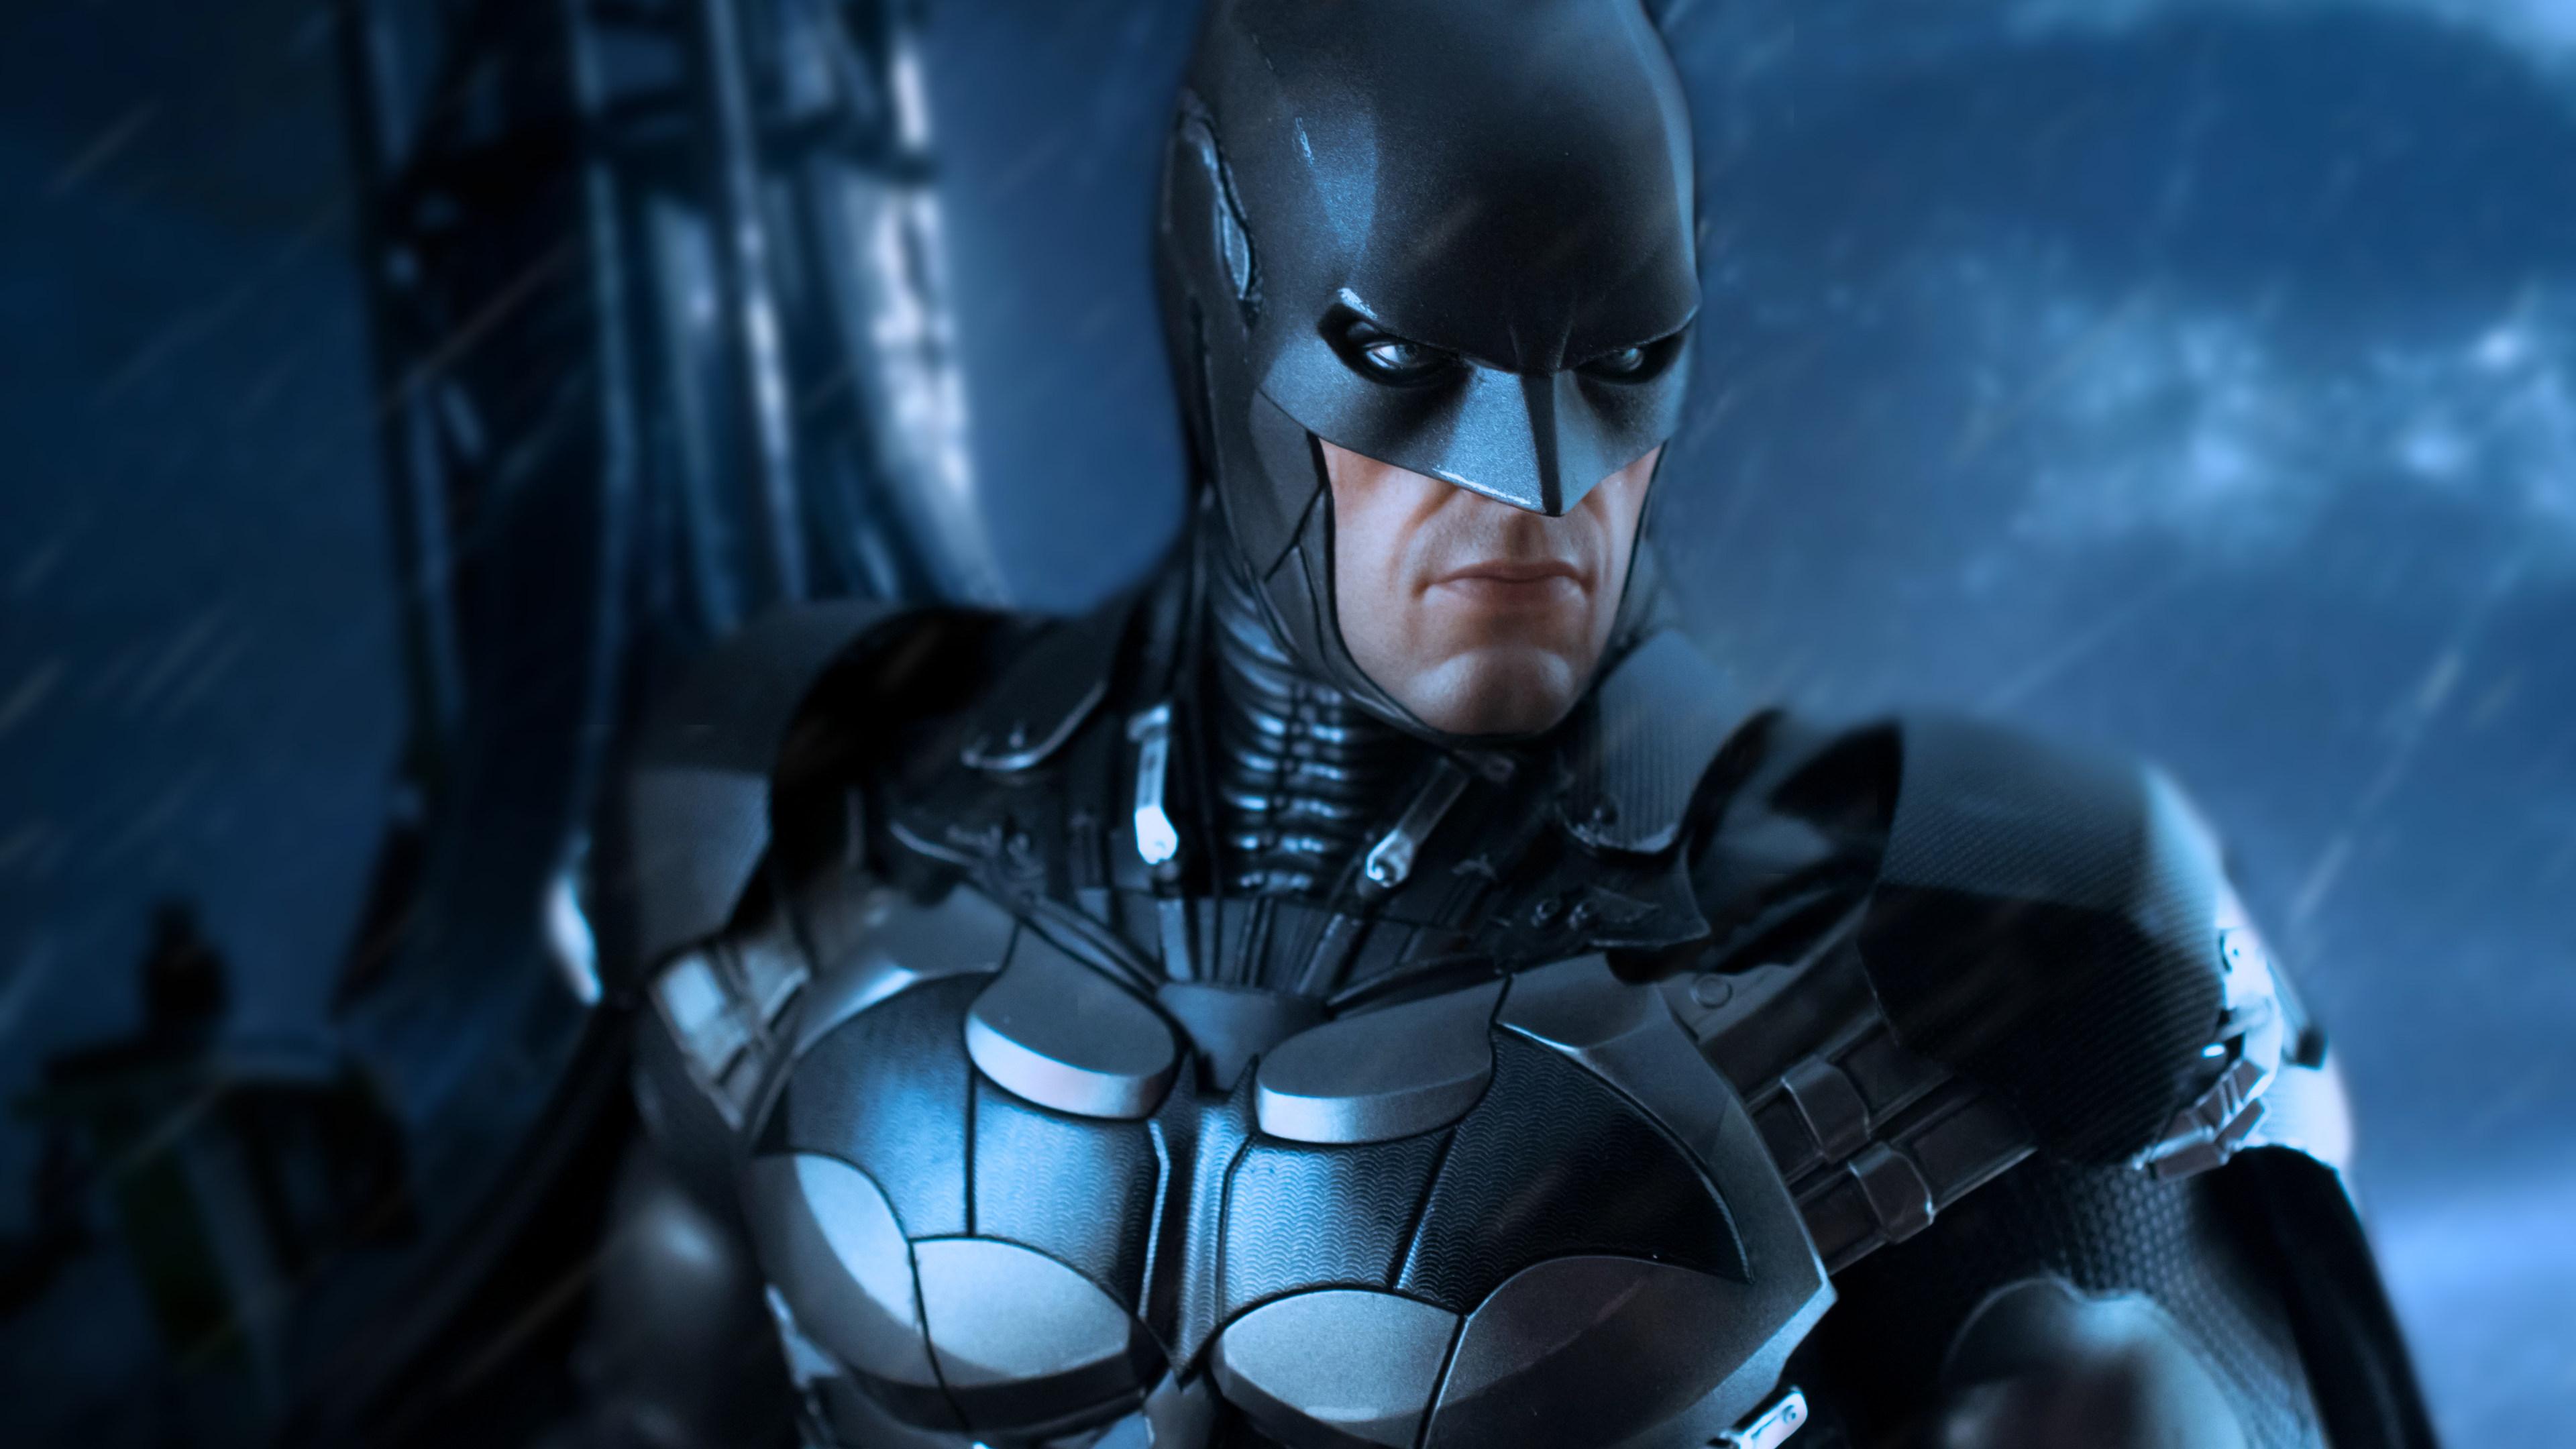 batman 4k new 2019 1544286907 - Batman 4K New 2019 - superheroes wallpapers, hd-wallpapers, digital art wallpapers, batman wallpapers, artwork wallpapers, 5k wallpapers, 4k-wallpapers